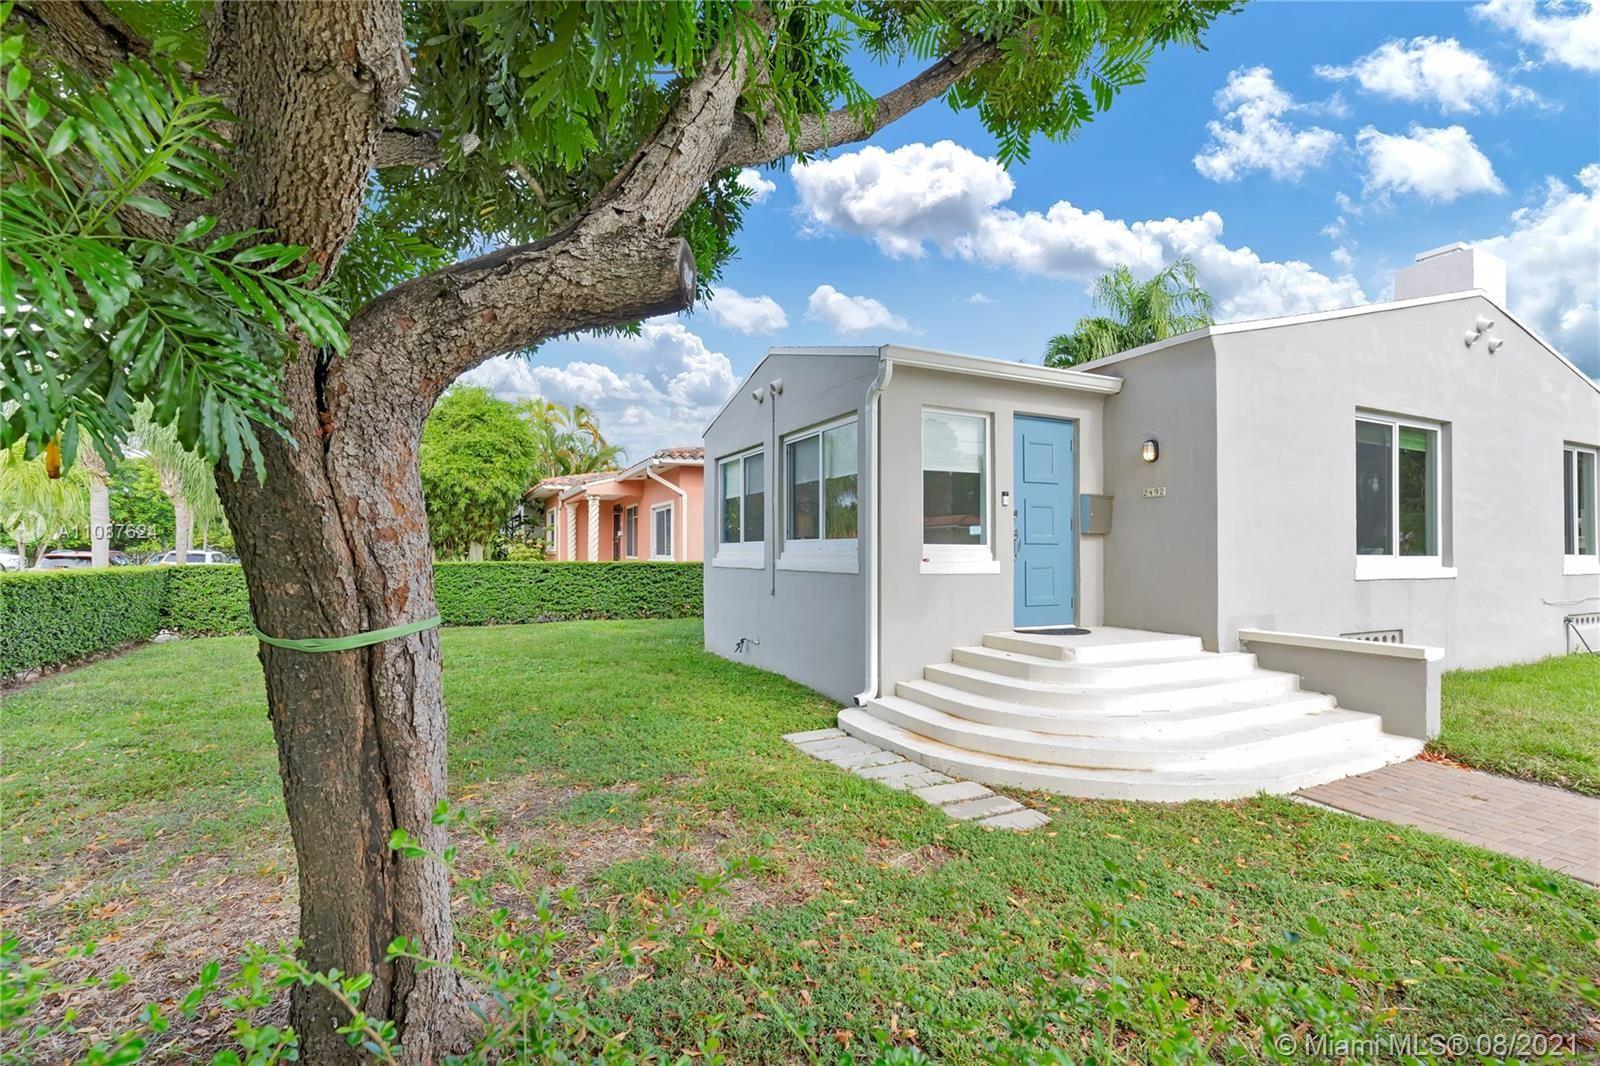 2492 SW 23rd St, Miami, FL 33145 - #: A11087624